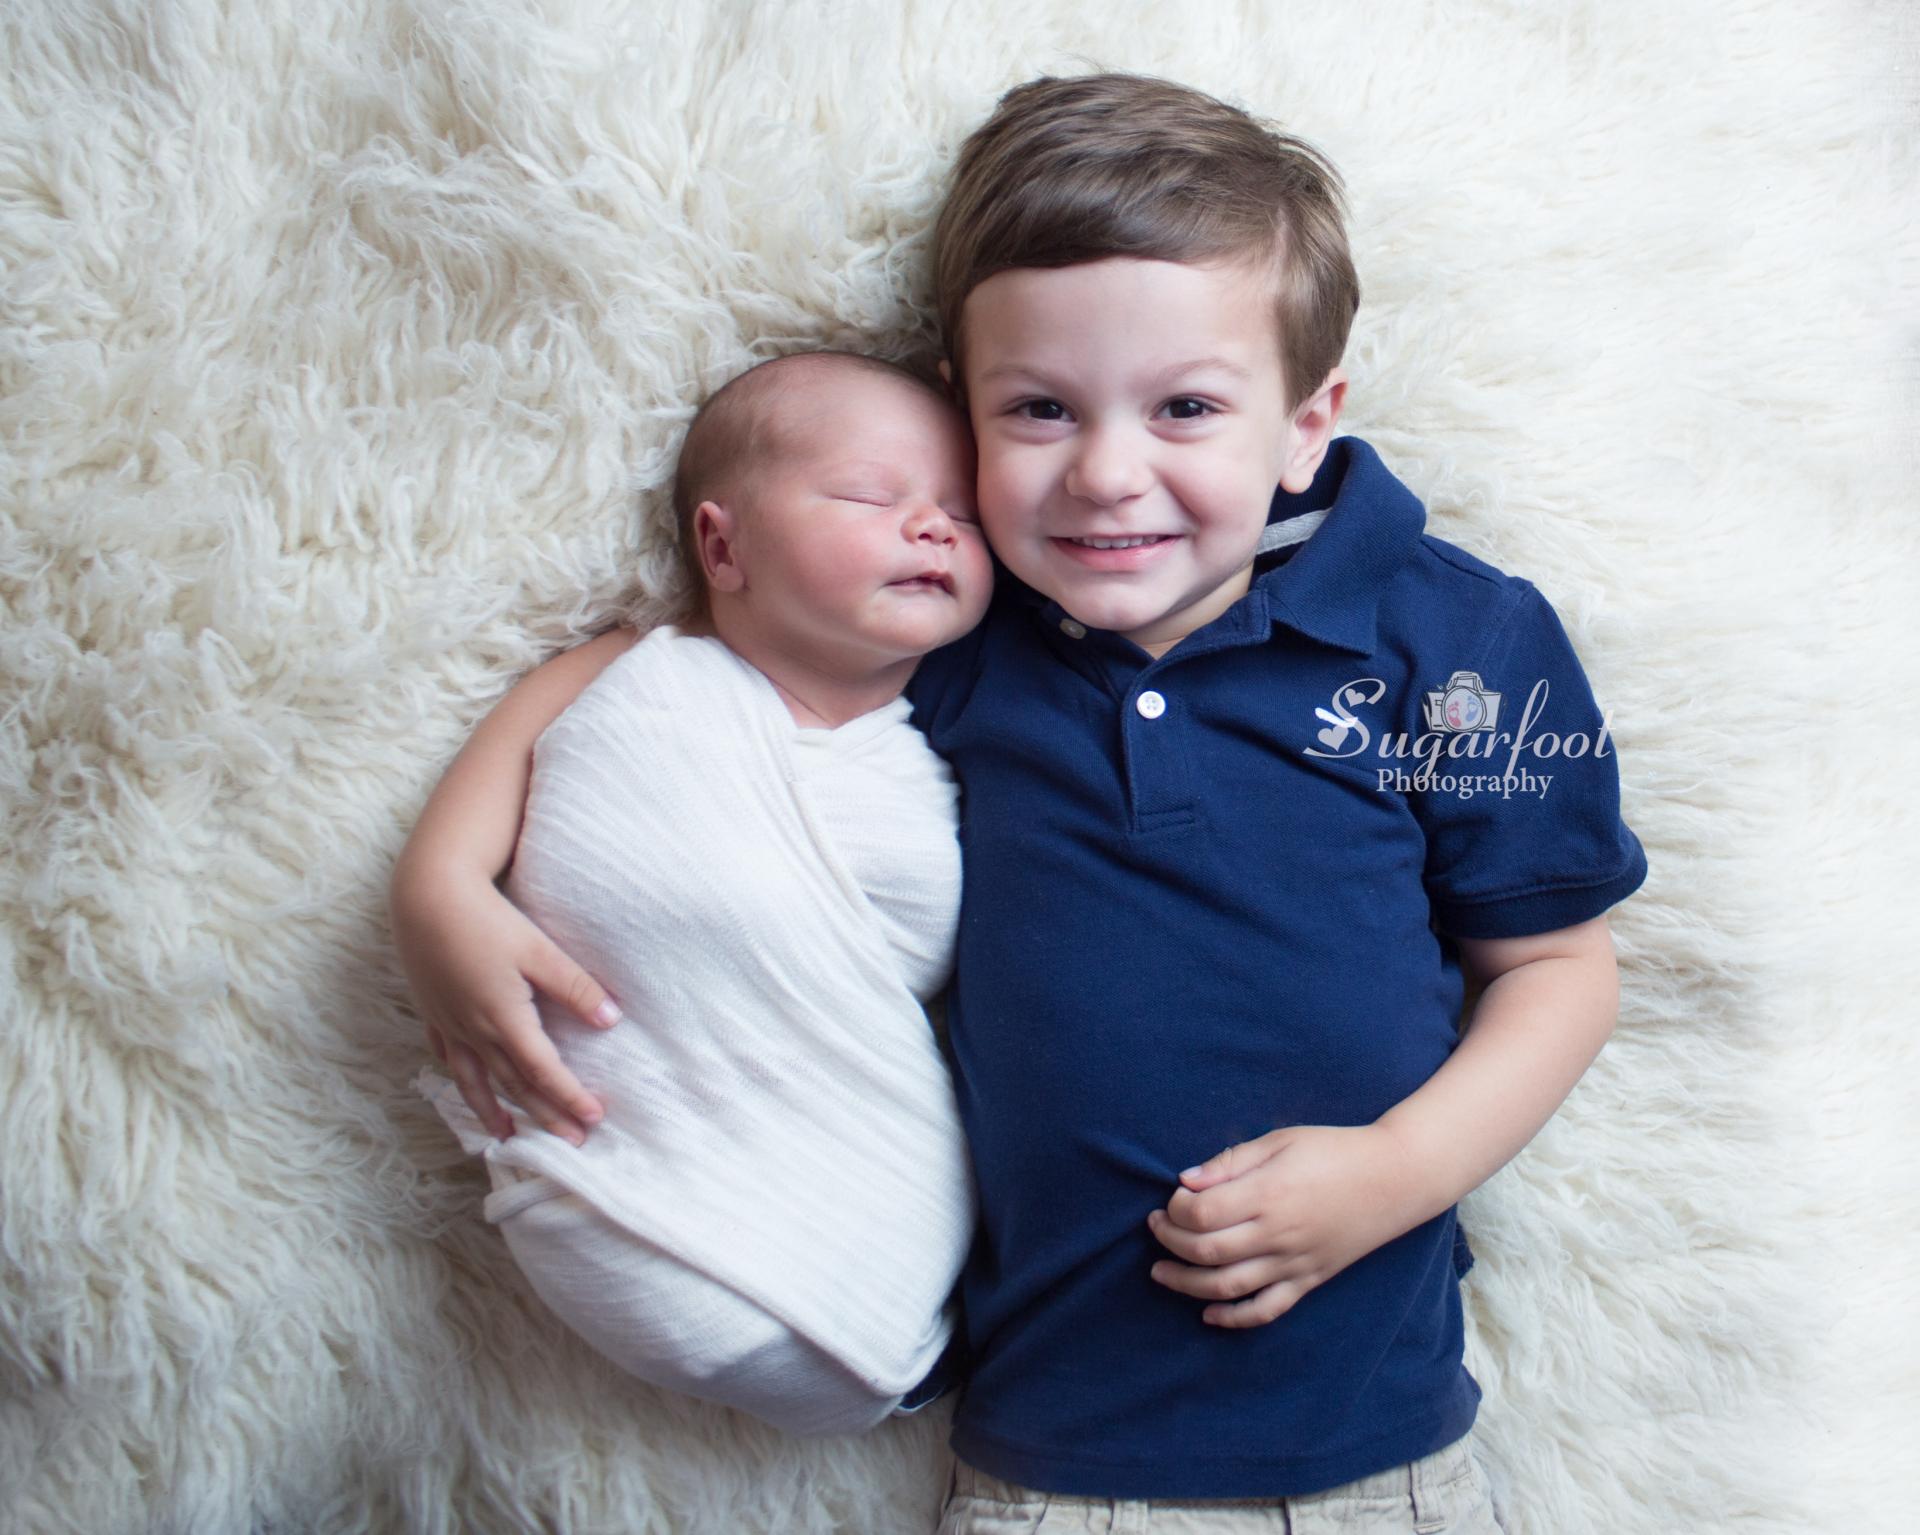 stl_newborn_baby_photographer_maternity_photographer